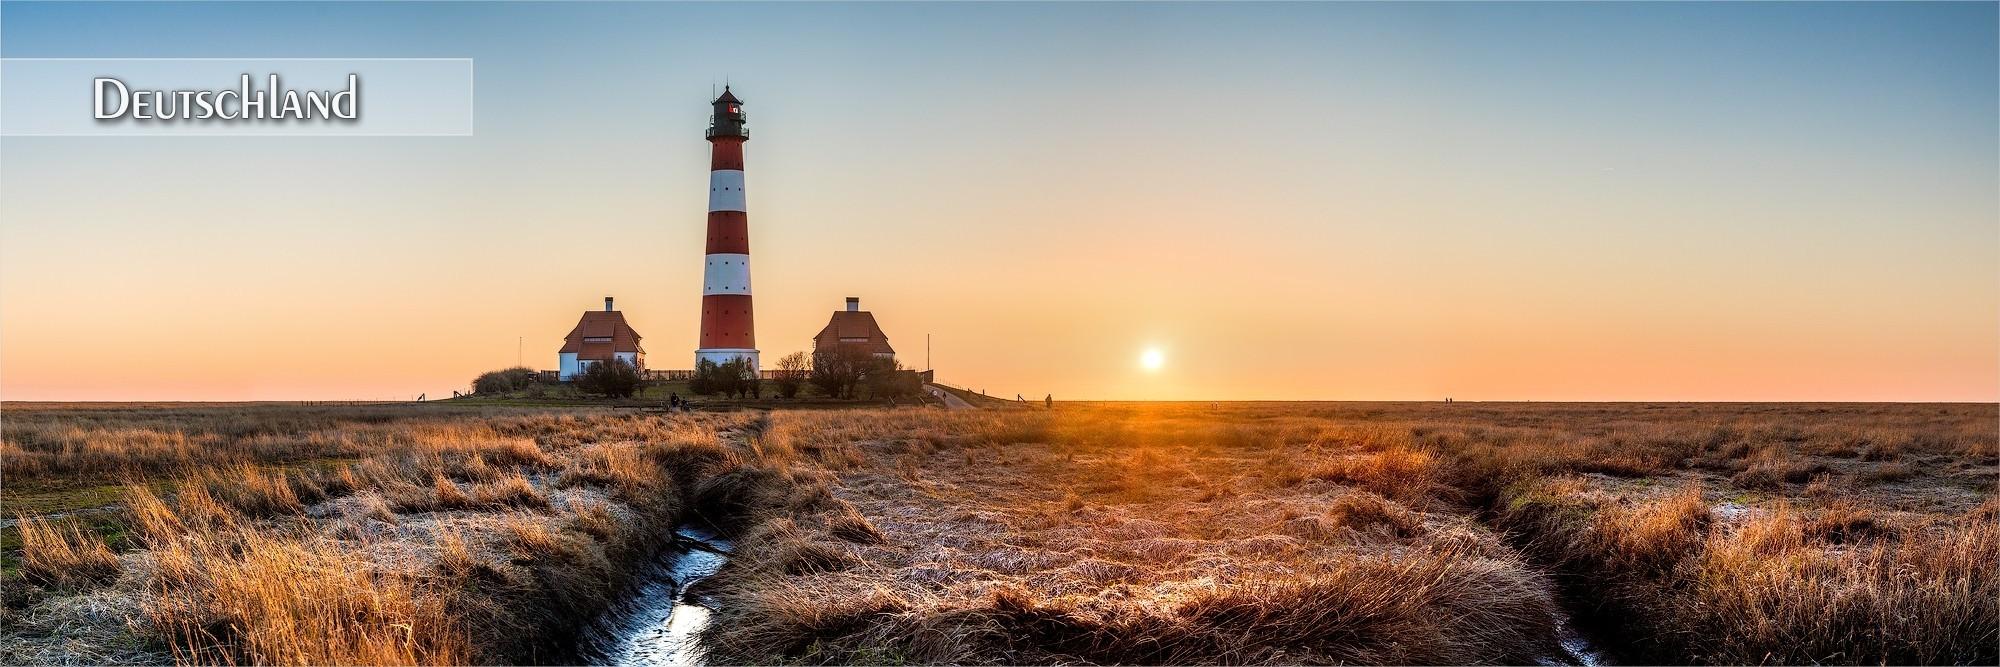 FineArt & Panoramafotografien aus Deutschland